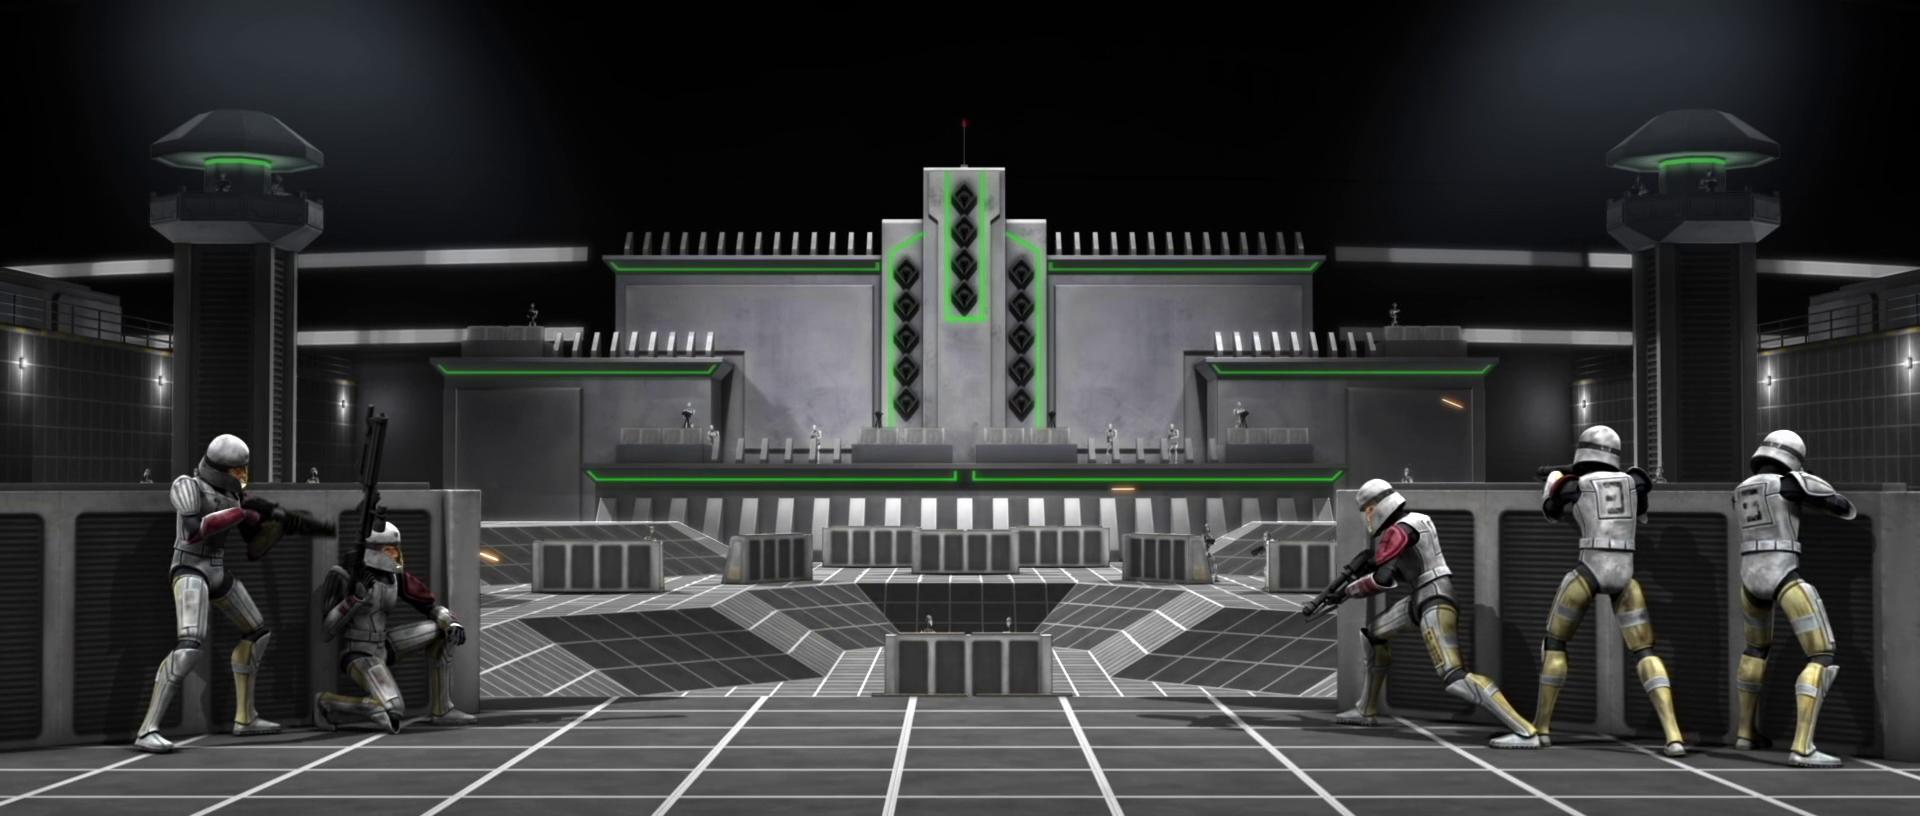 Citadel Challenge | Wookieepedia | Fandom